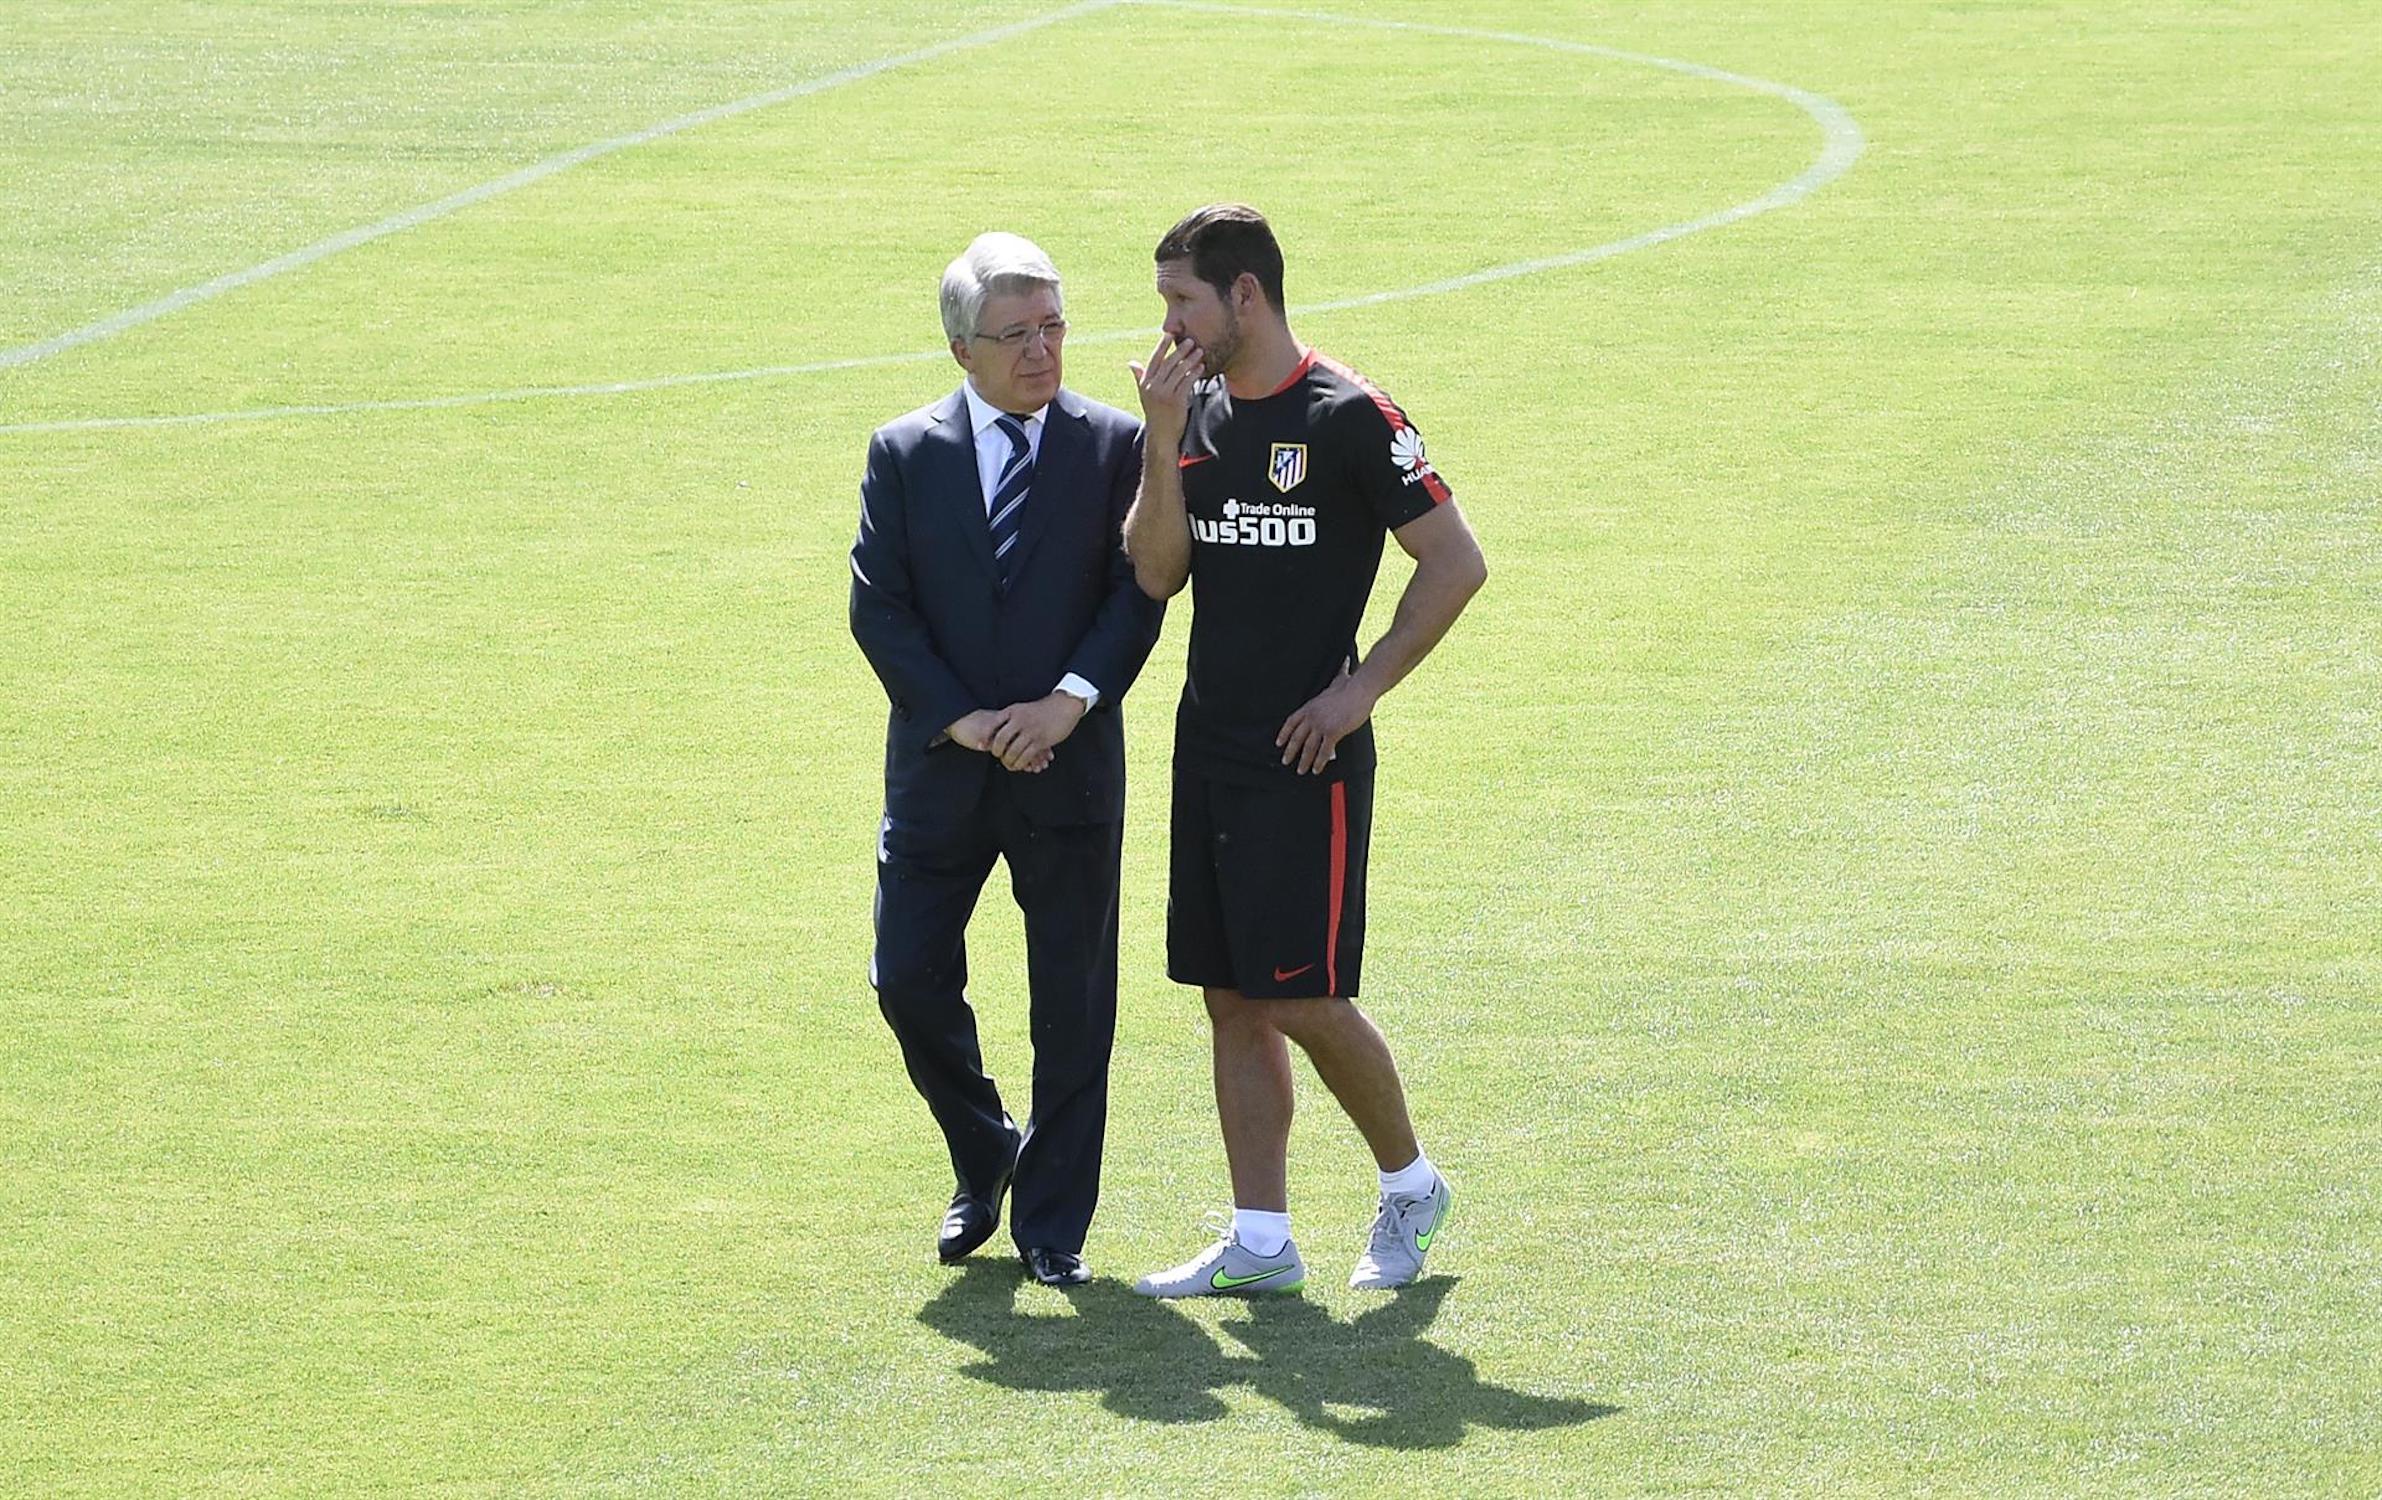 Cerezo i Simeone, durant un entrenament de l'Atlètic de Madrid | Europa Press